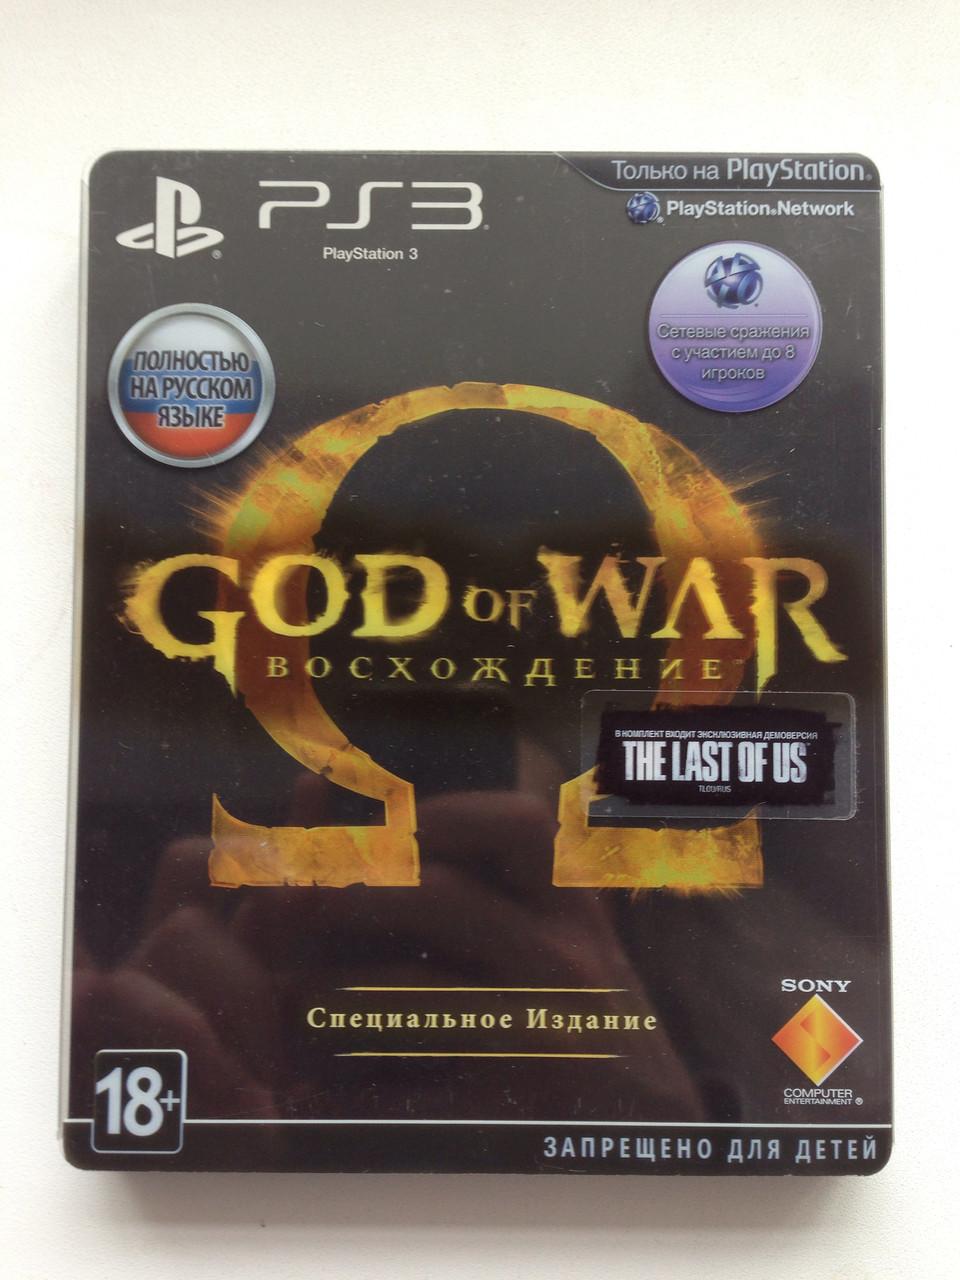 God of War Восхождение Steel book